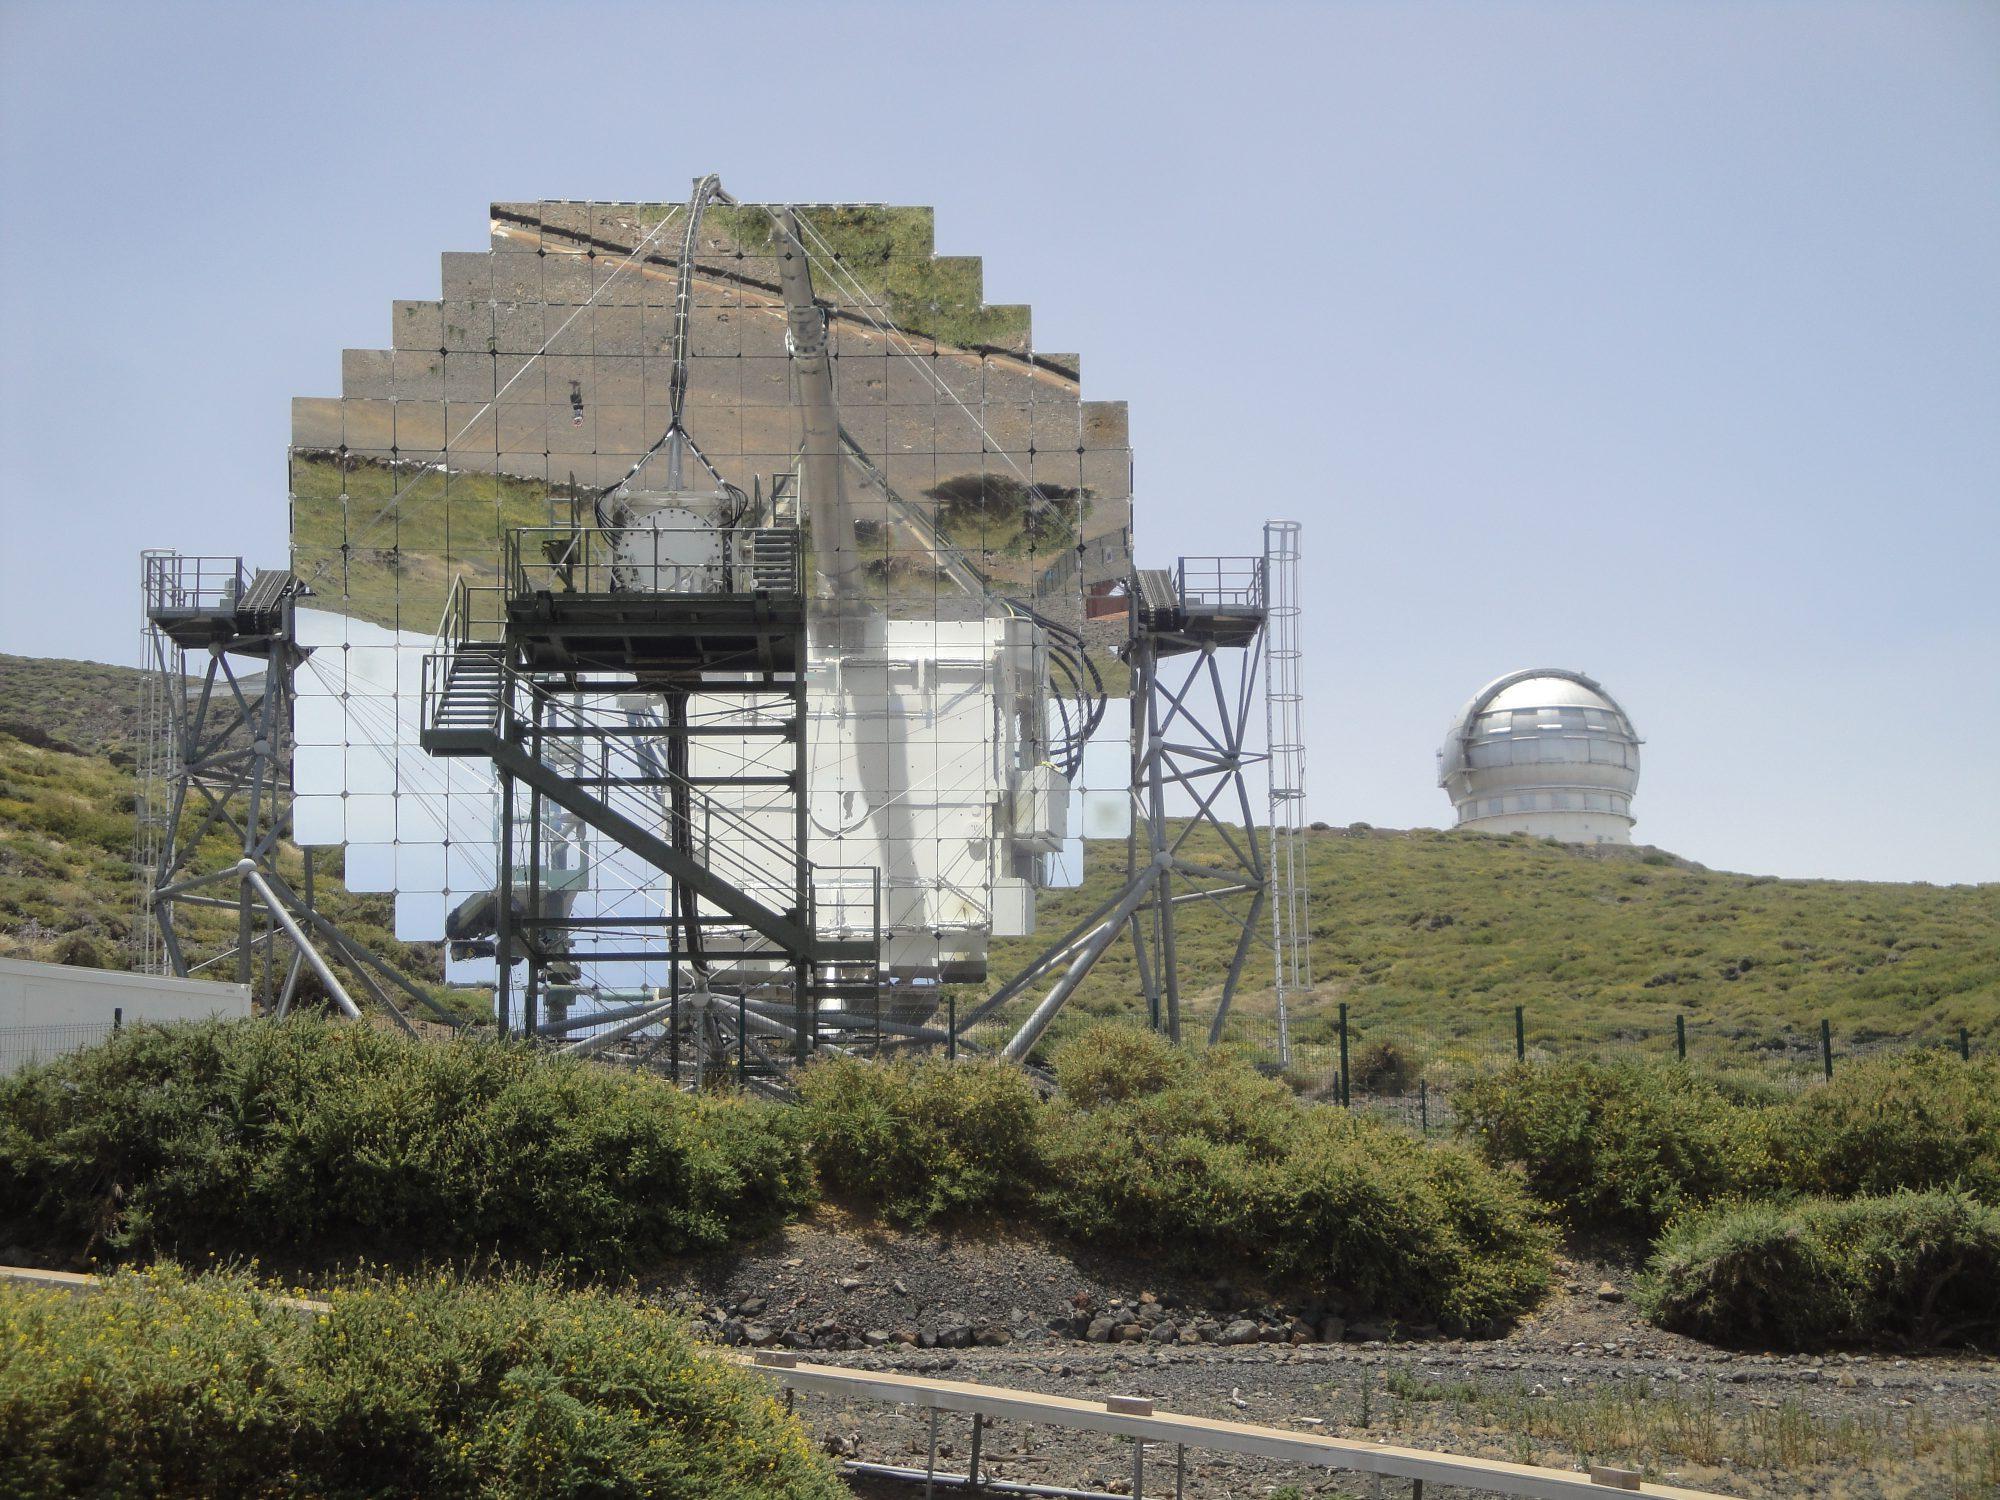 MAGIC, télescope IACT